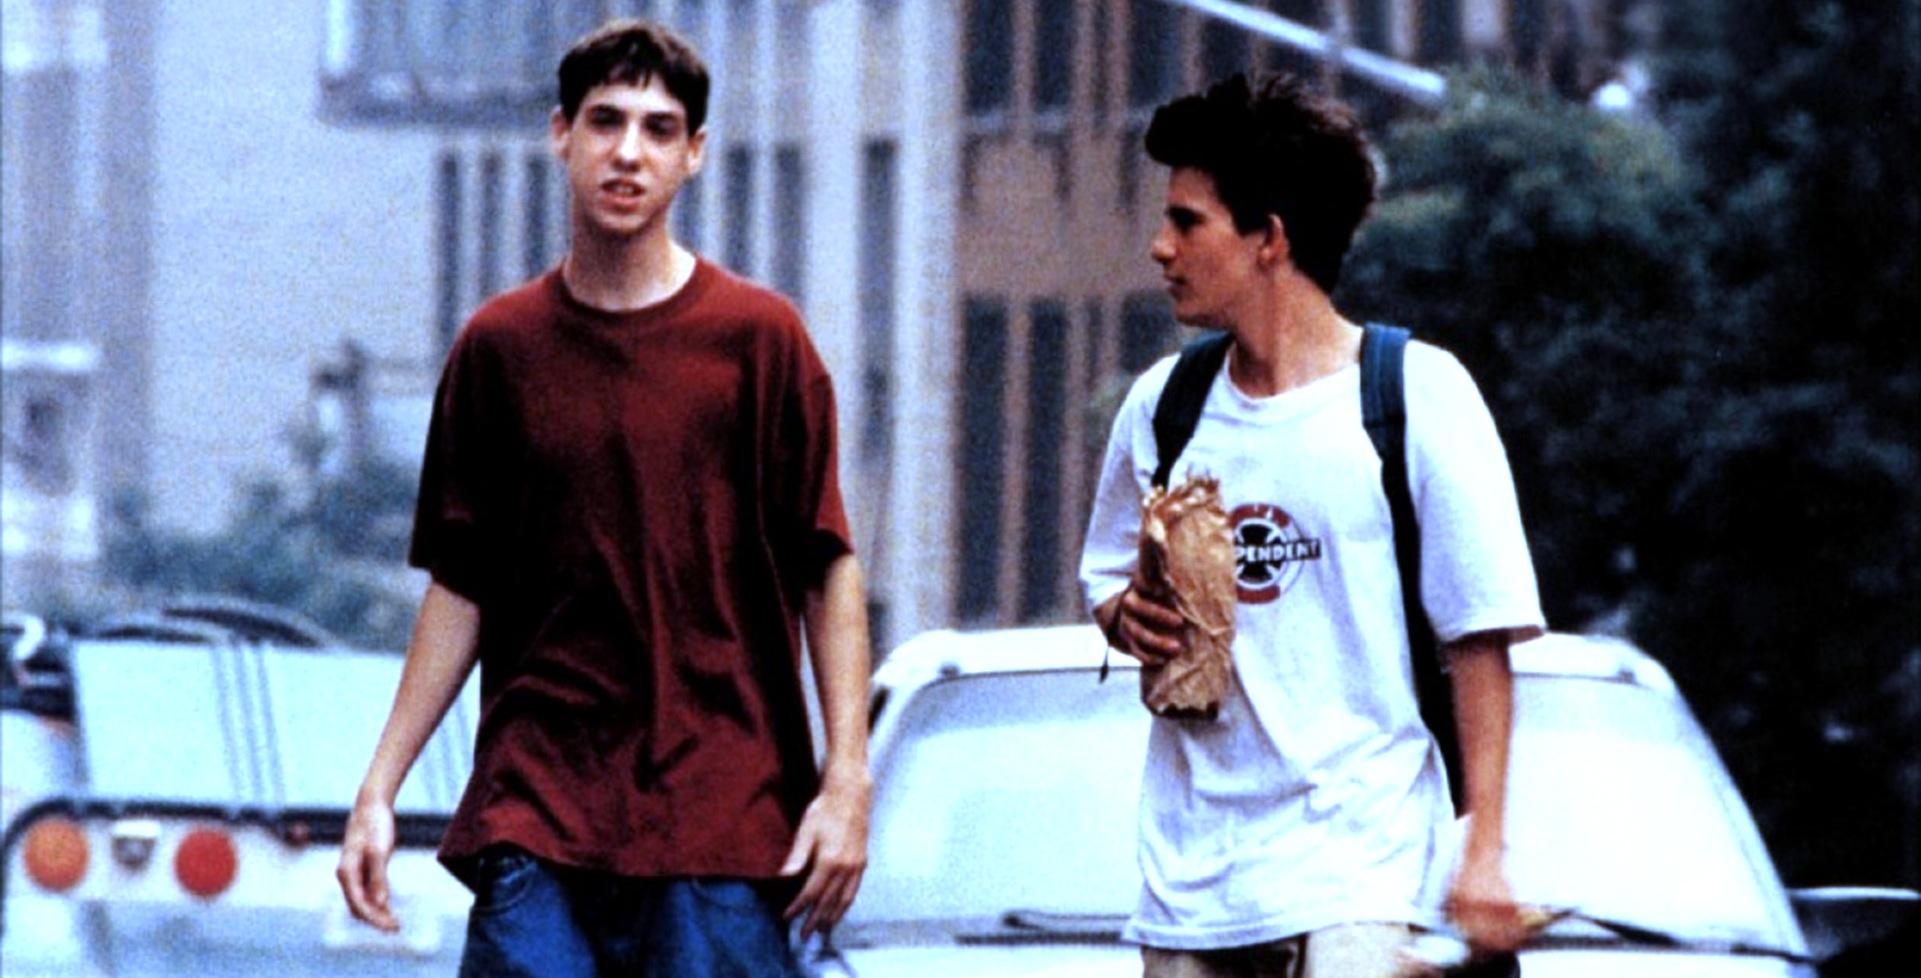 Meilleurs films d'ados 2000